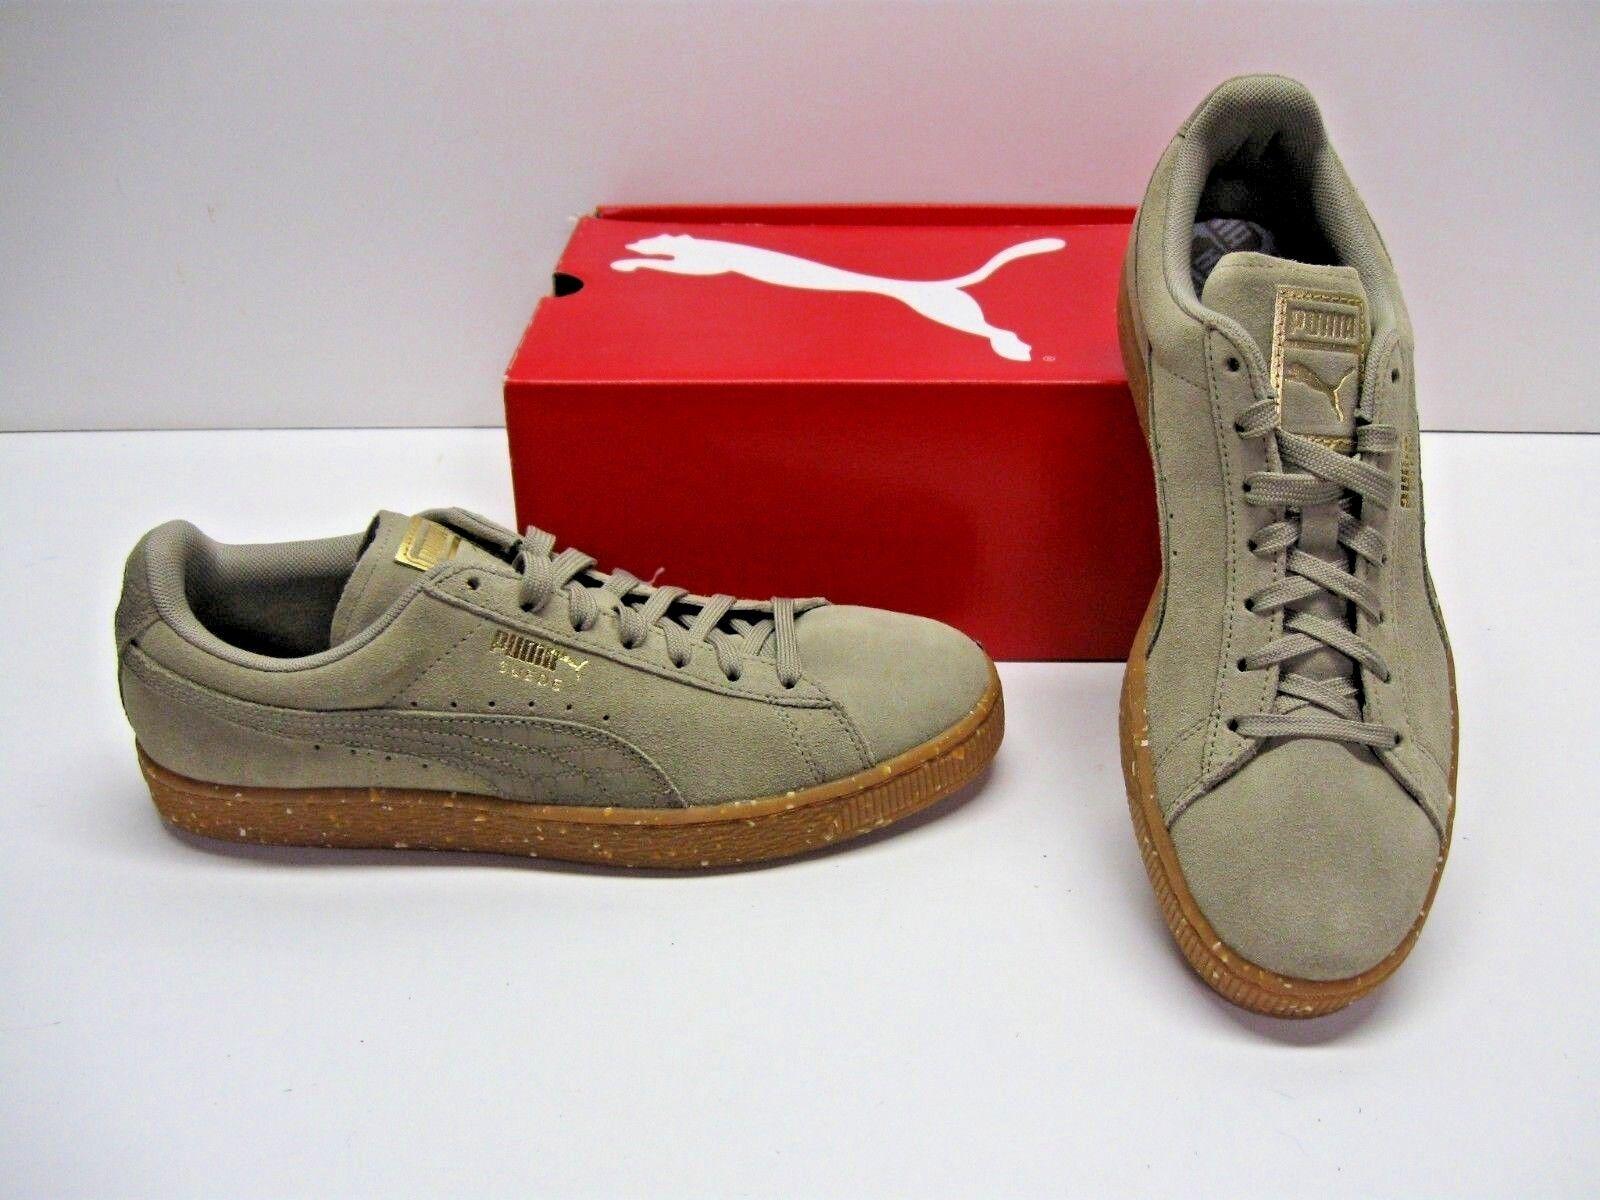 Puma Puma Puma Suede Classic FT Beige Gum Rubber Soles Fashion baskets chaussures femmes 11 7328ca